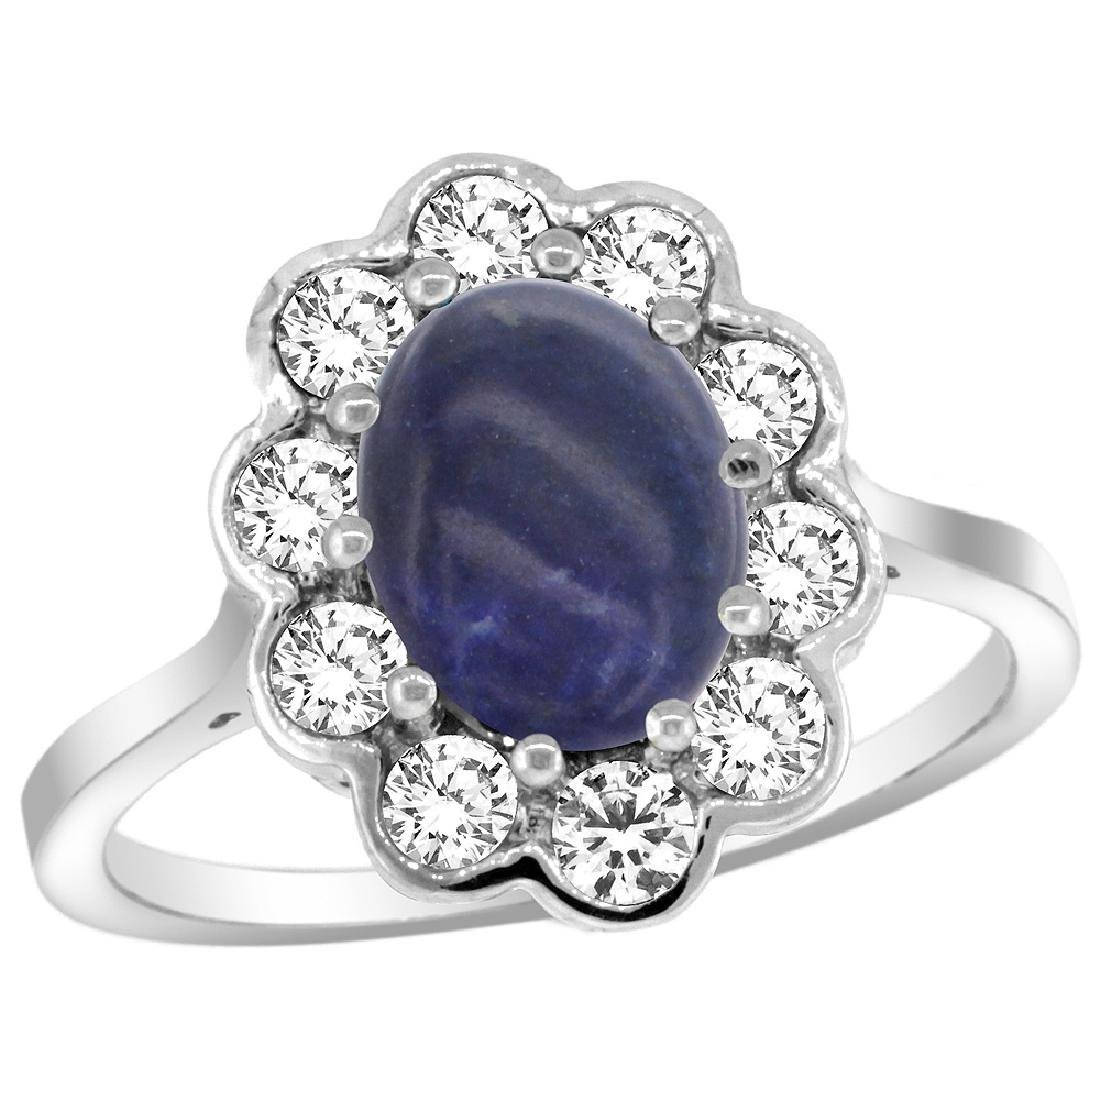 Natural 2.38 ctw Lapis-lazuli & Diamond Engagement Ring